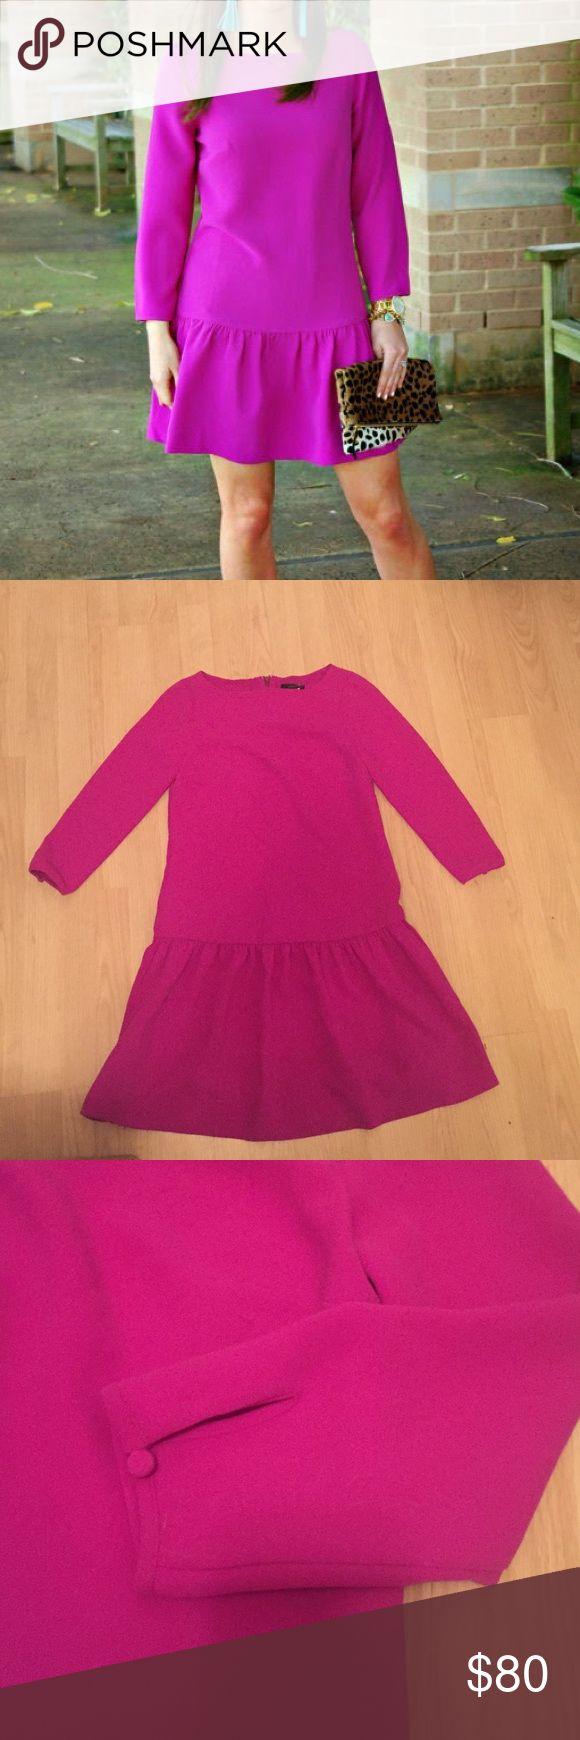 ‼️SALE J crew Pink Fuchsia drop waist dress NWT Great new j crew dress. 3/4 sleeves with button. Hidden back zipper. Great with boots for fall! J. Crew Dresses Mini